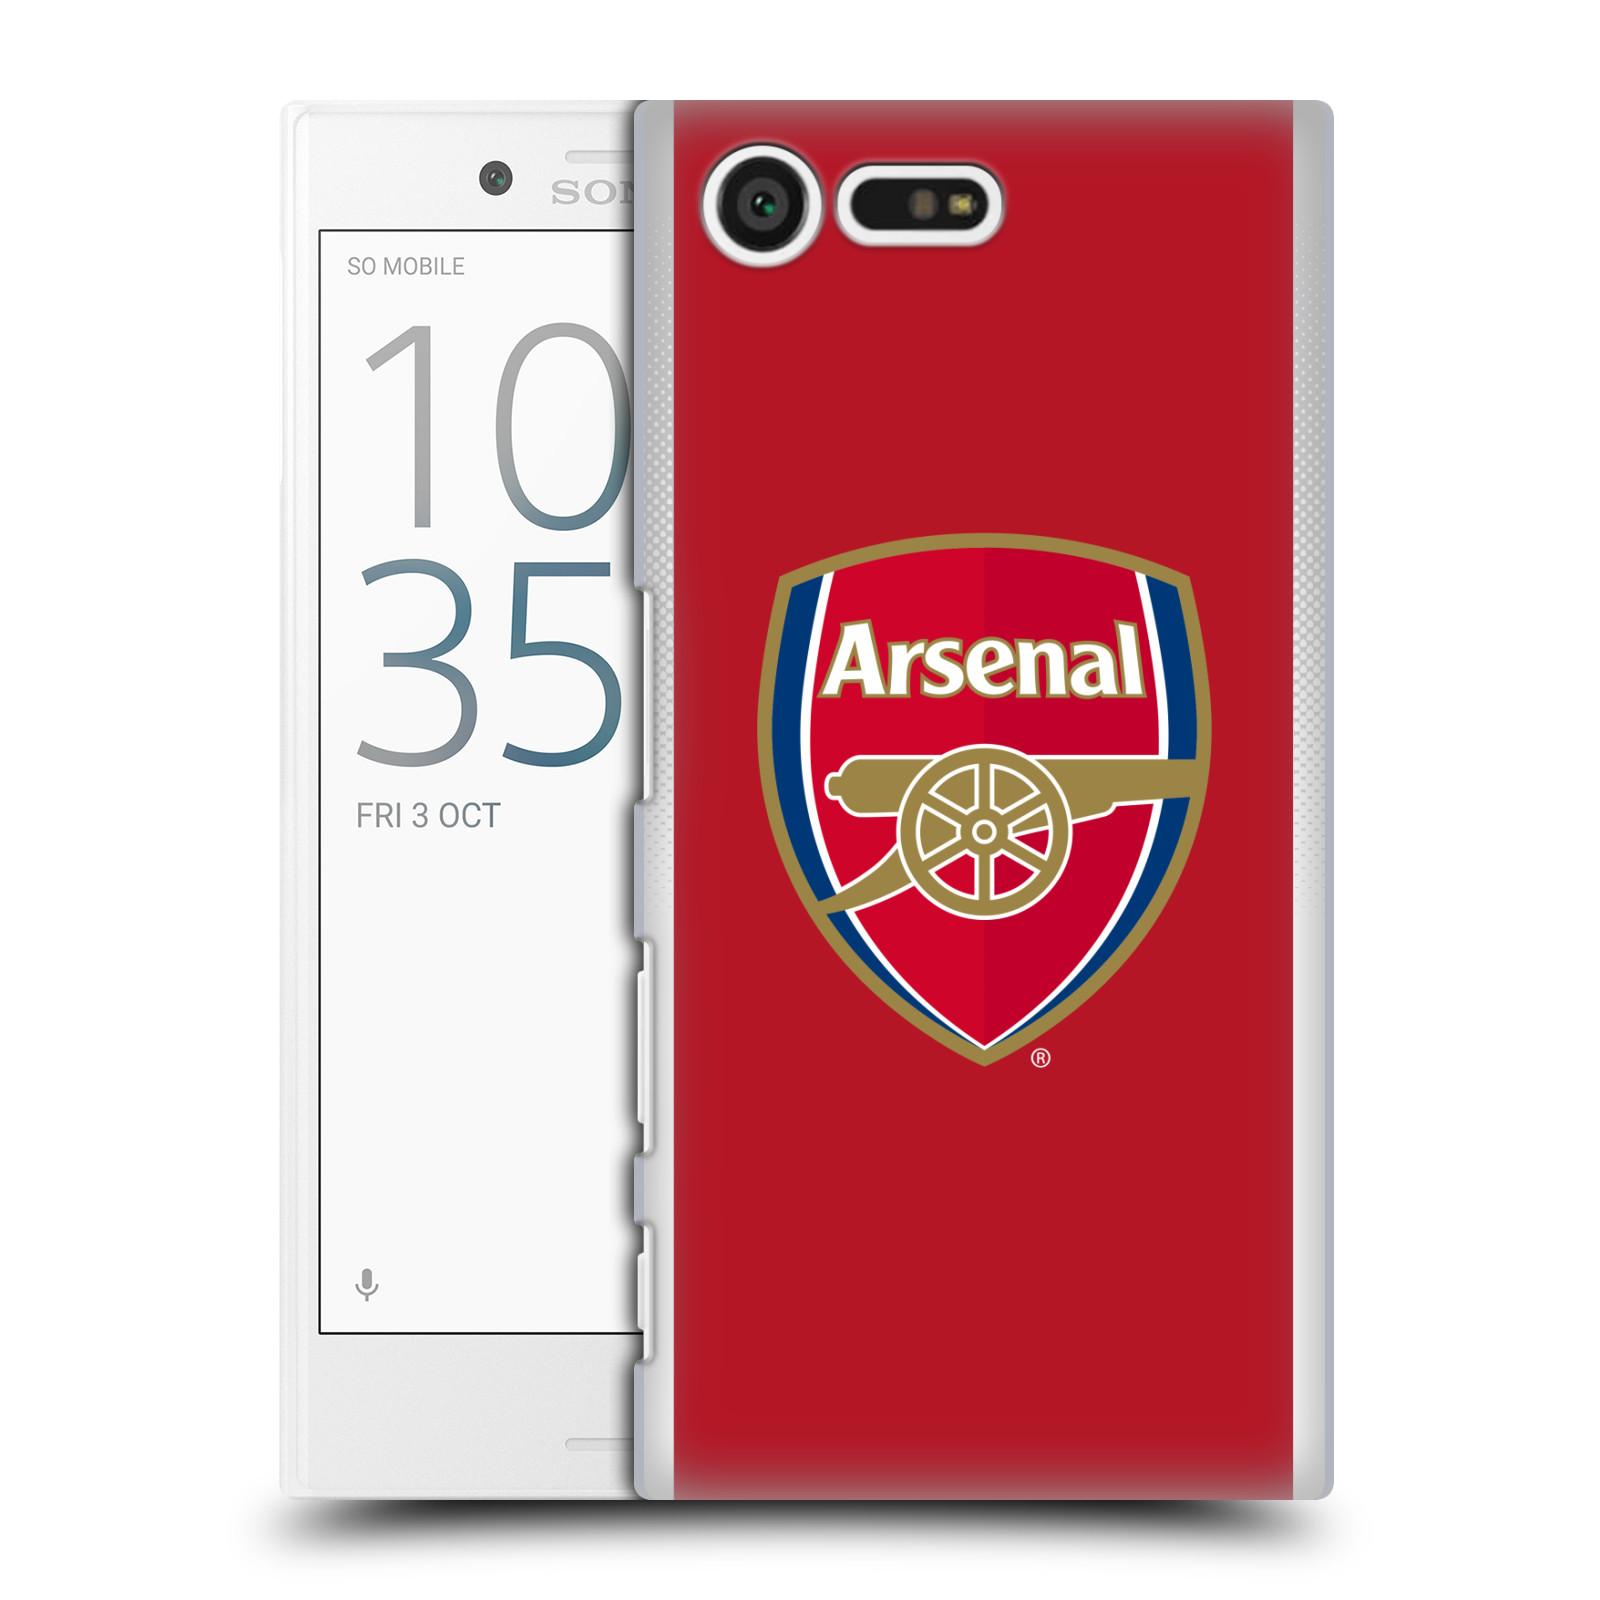 Plastové pouzdro na mobil Sony Xperia X Compact - Head Case - Arsenal FC - Logo klubu